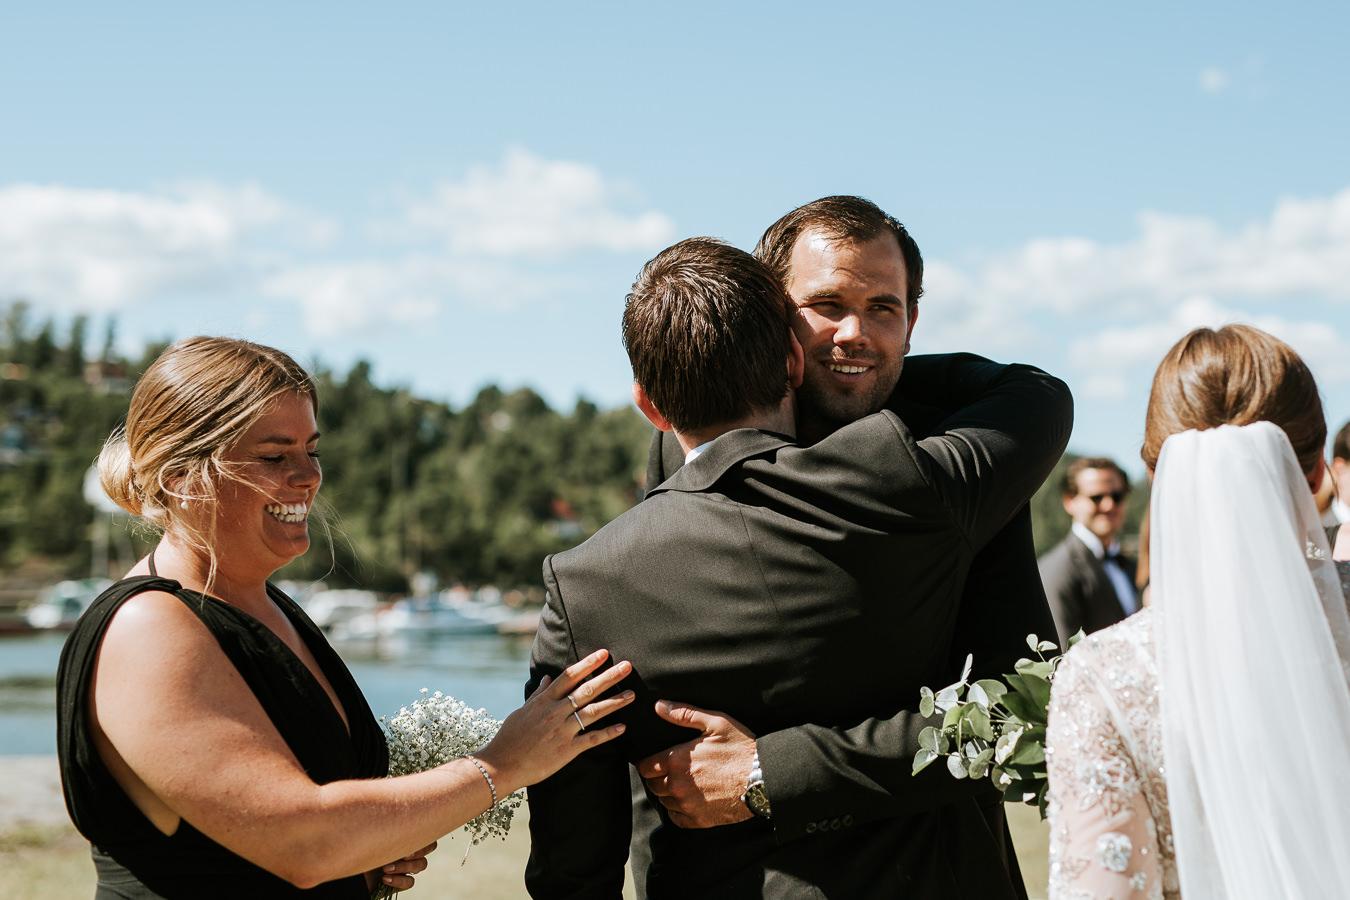 Bryllup-Hellviktangen-fotograf-tvedt-132.jpg